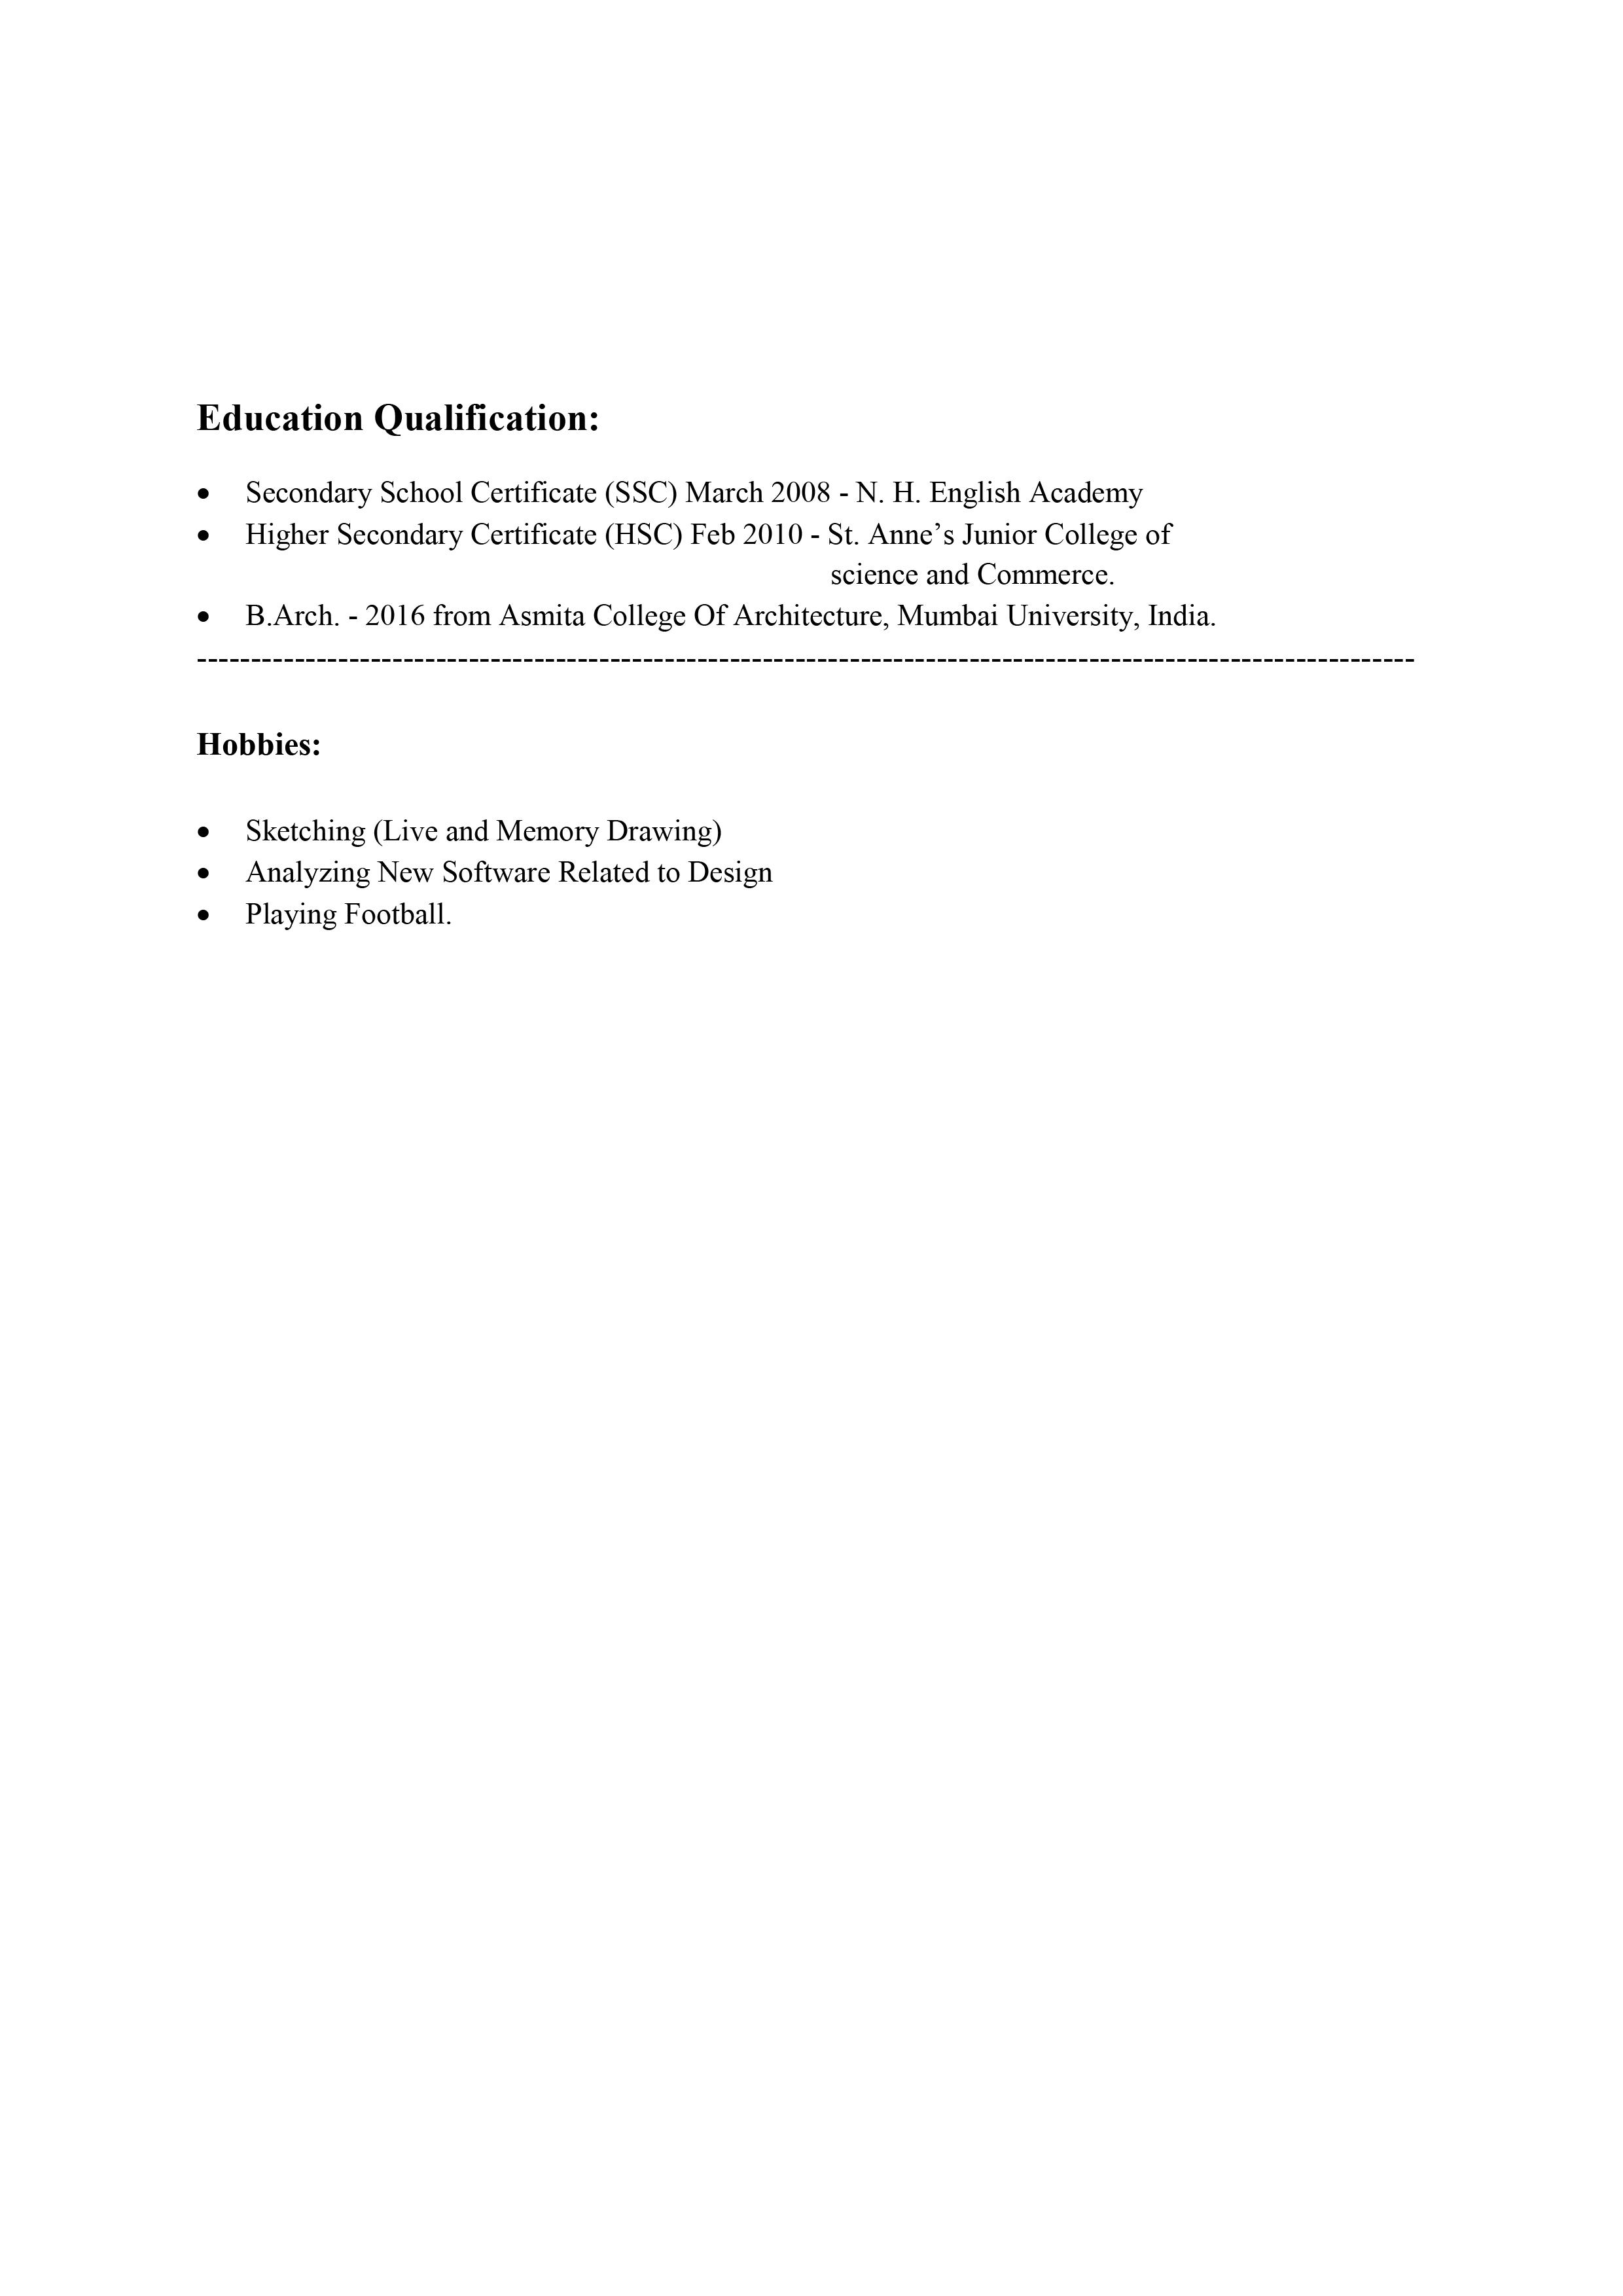 CV of Ar. Md. Ibrahim Mohiuddin pg 4